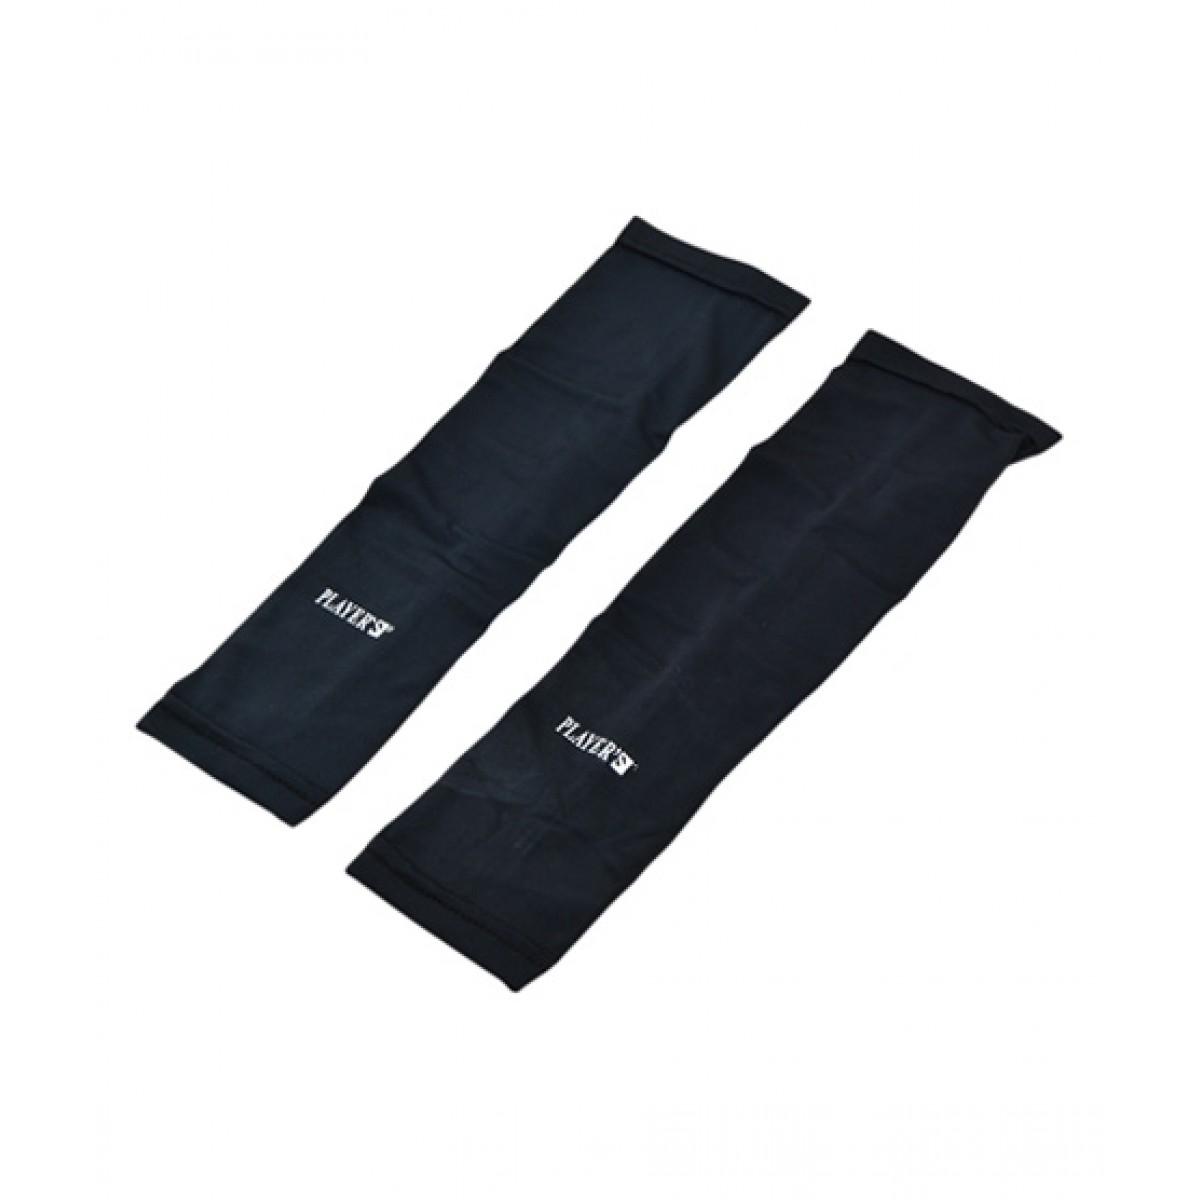 Asaan Buy Sports Arm Sleeves Pack Of 2 Black (SY-1649)